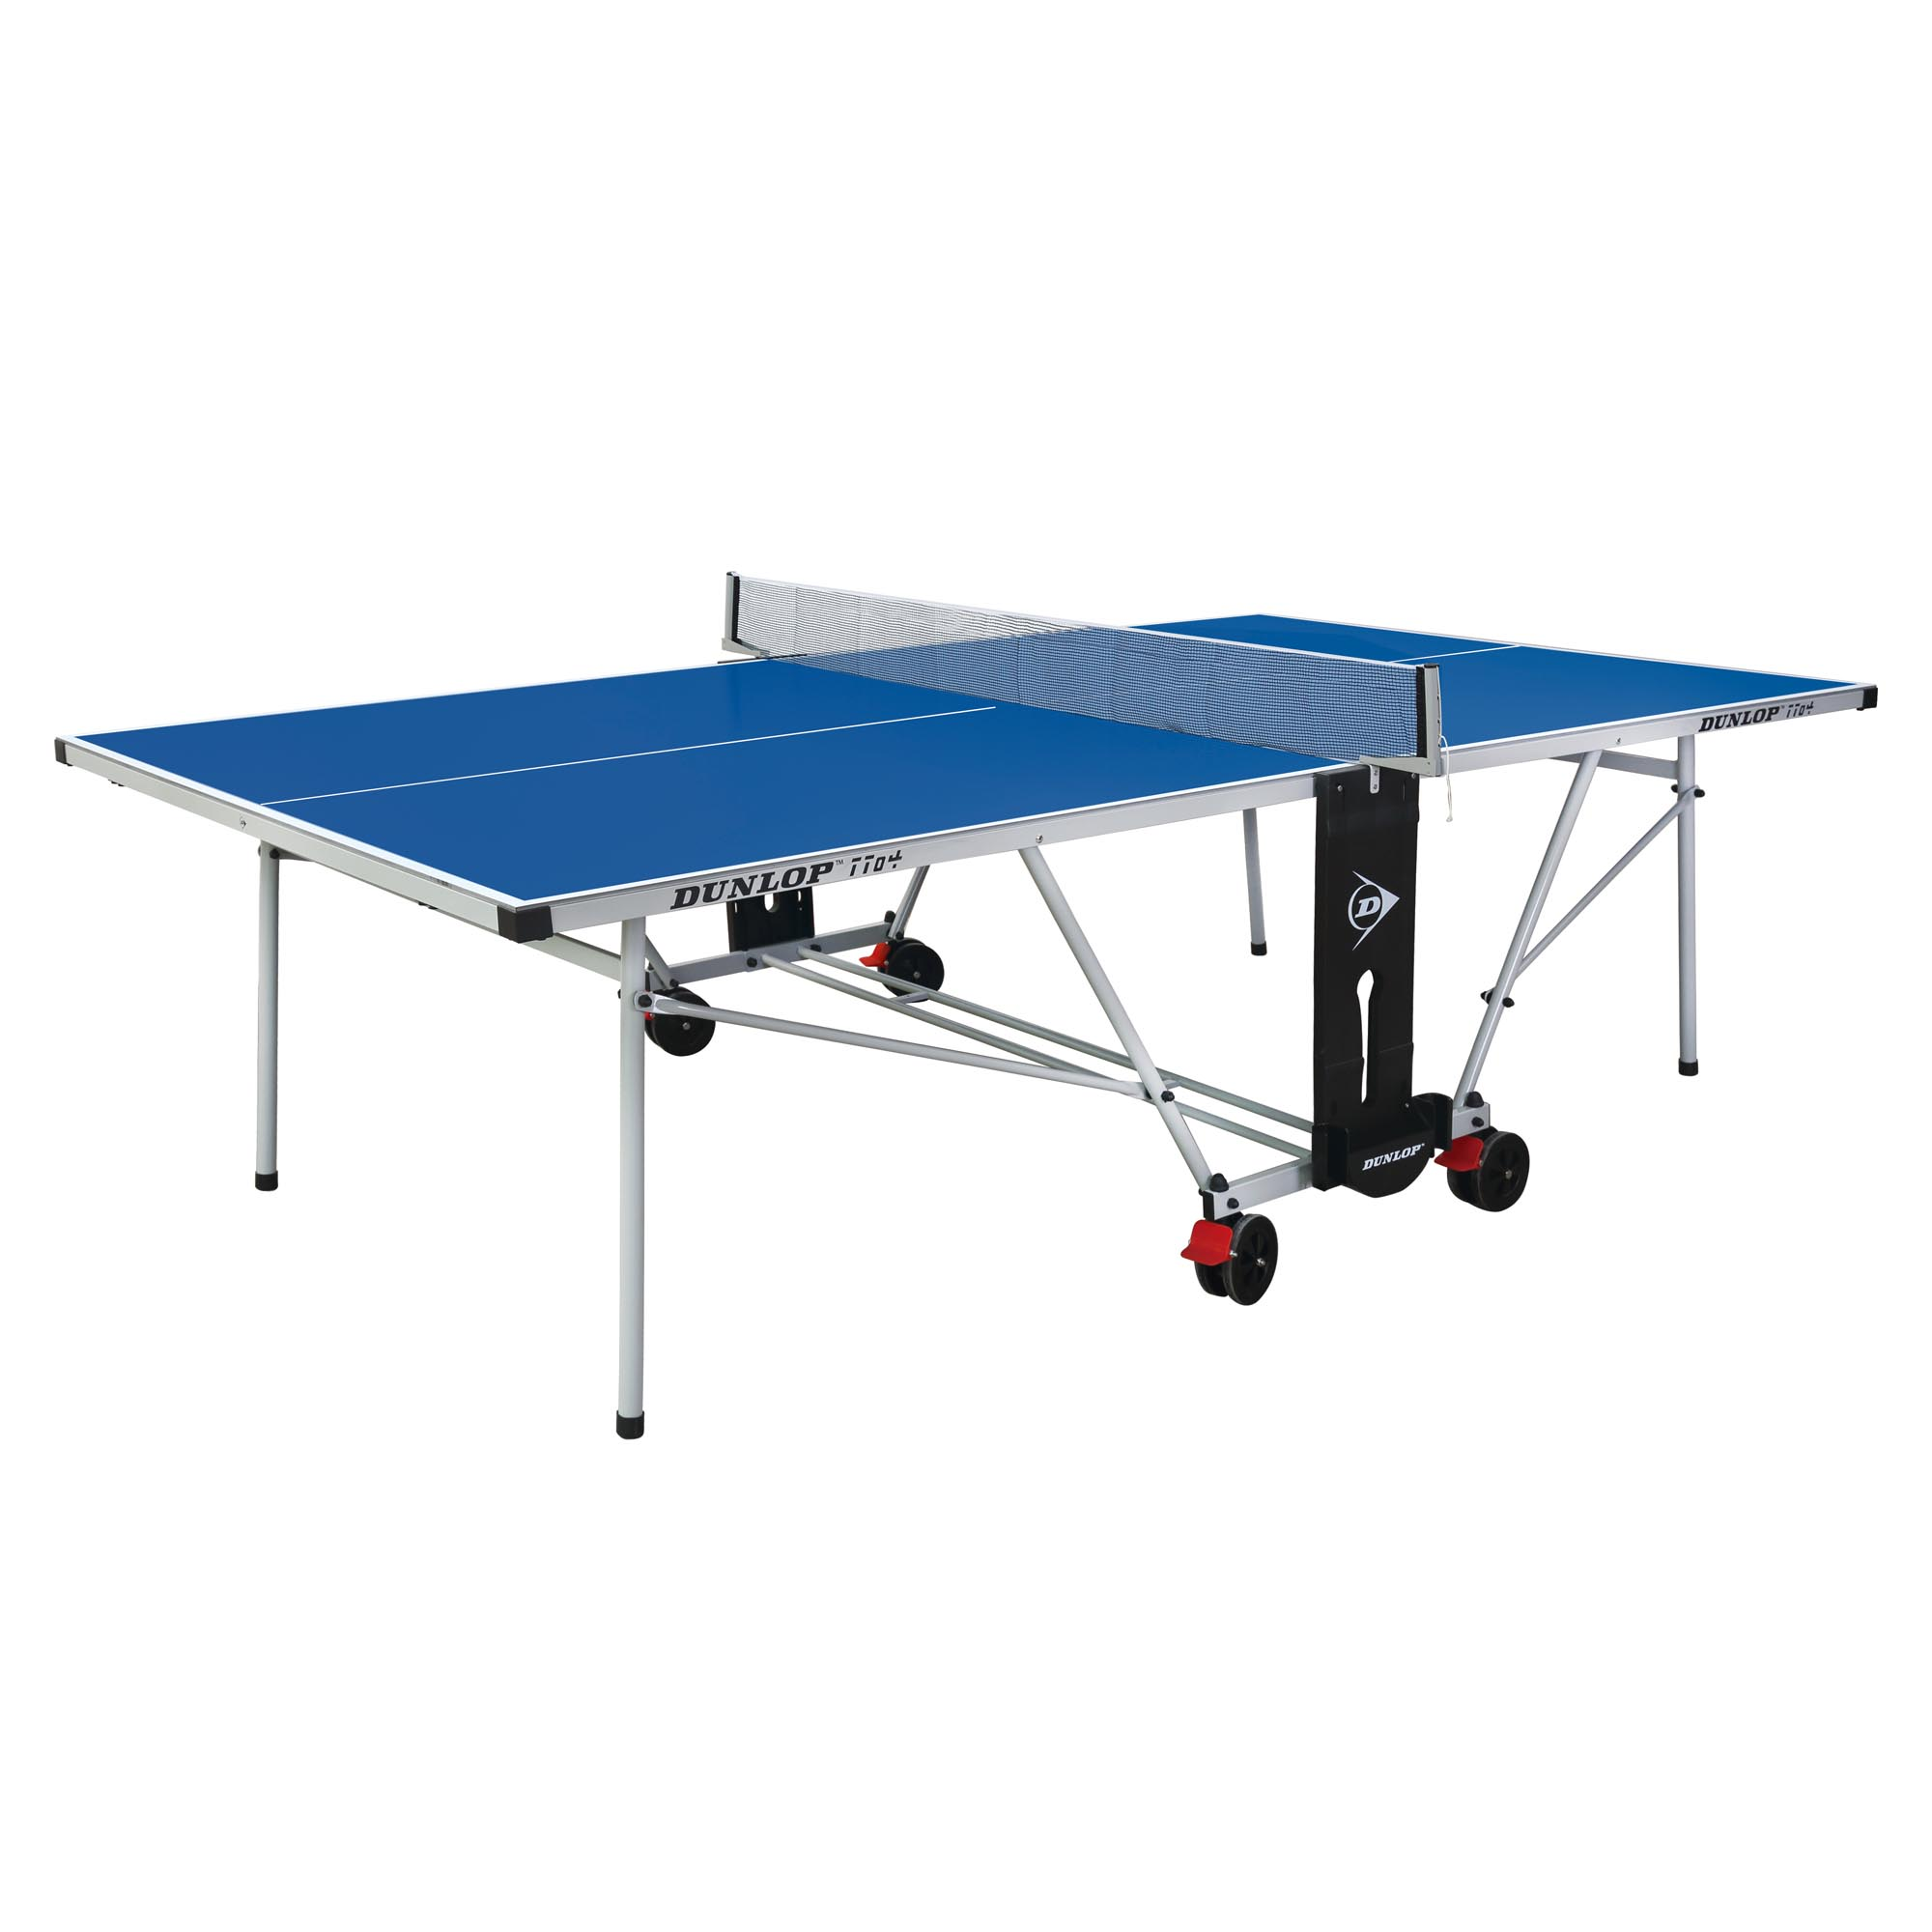 Dunlop TTo4 Outdoor Table Tennis Table  Blue